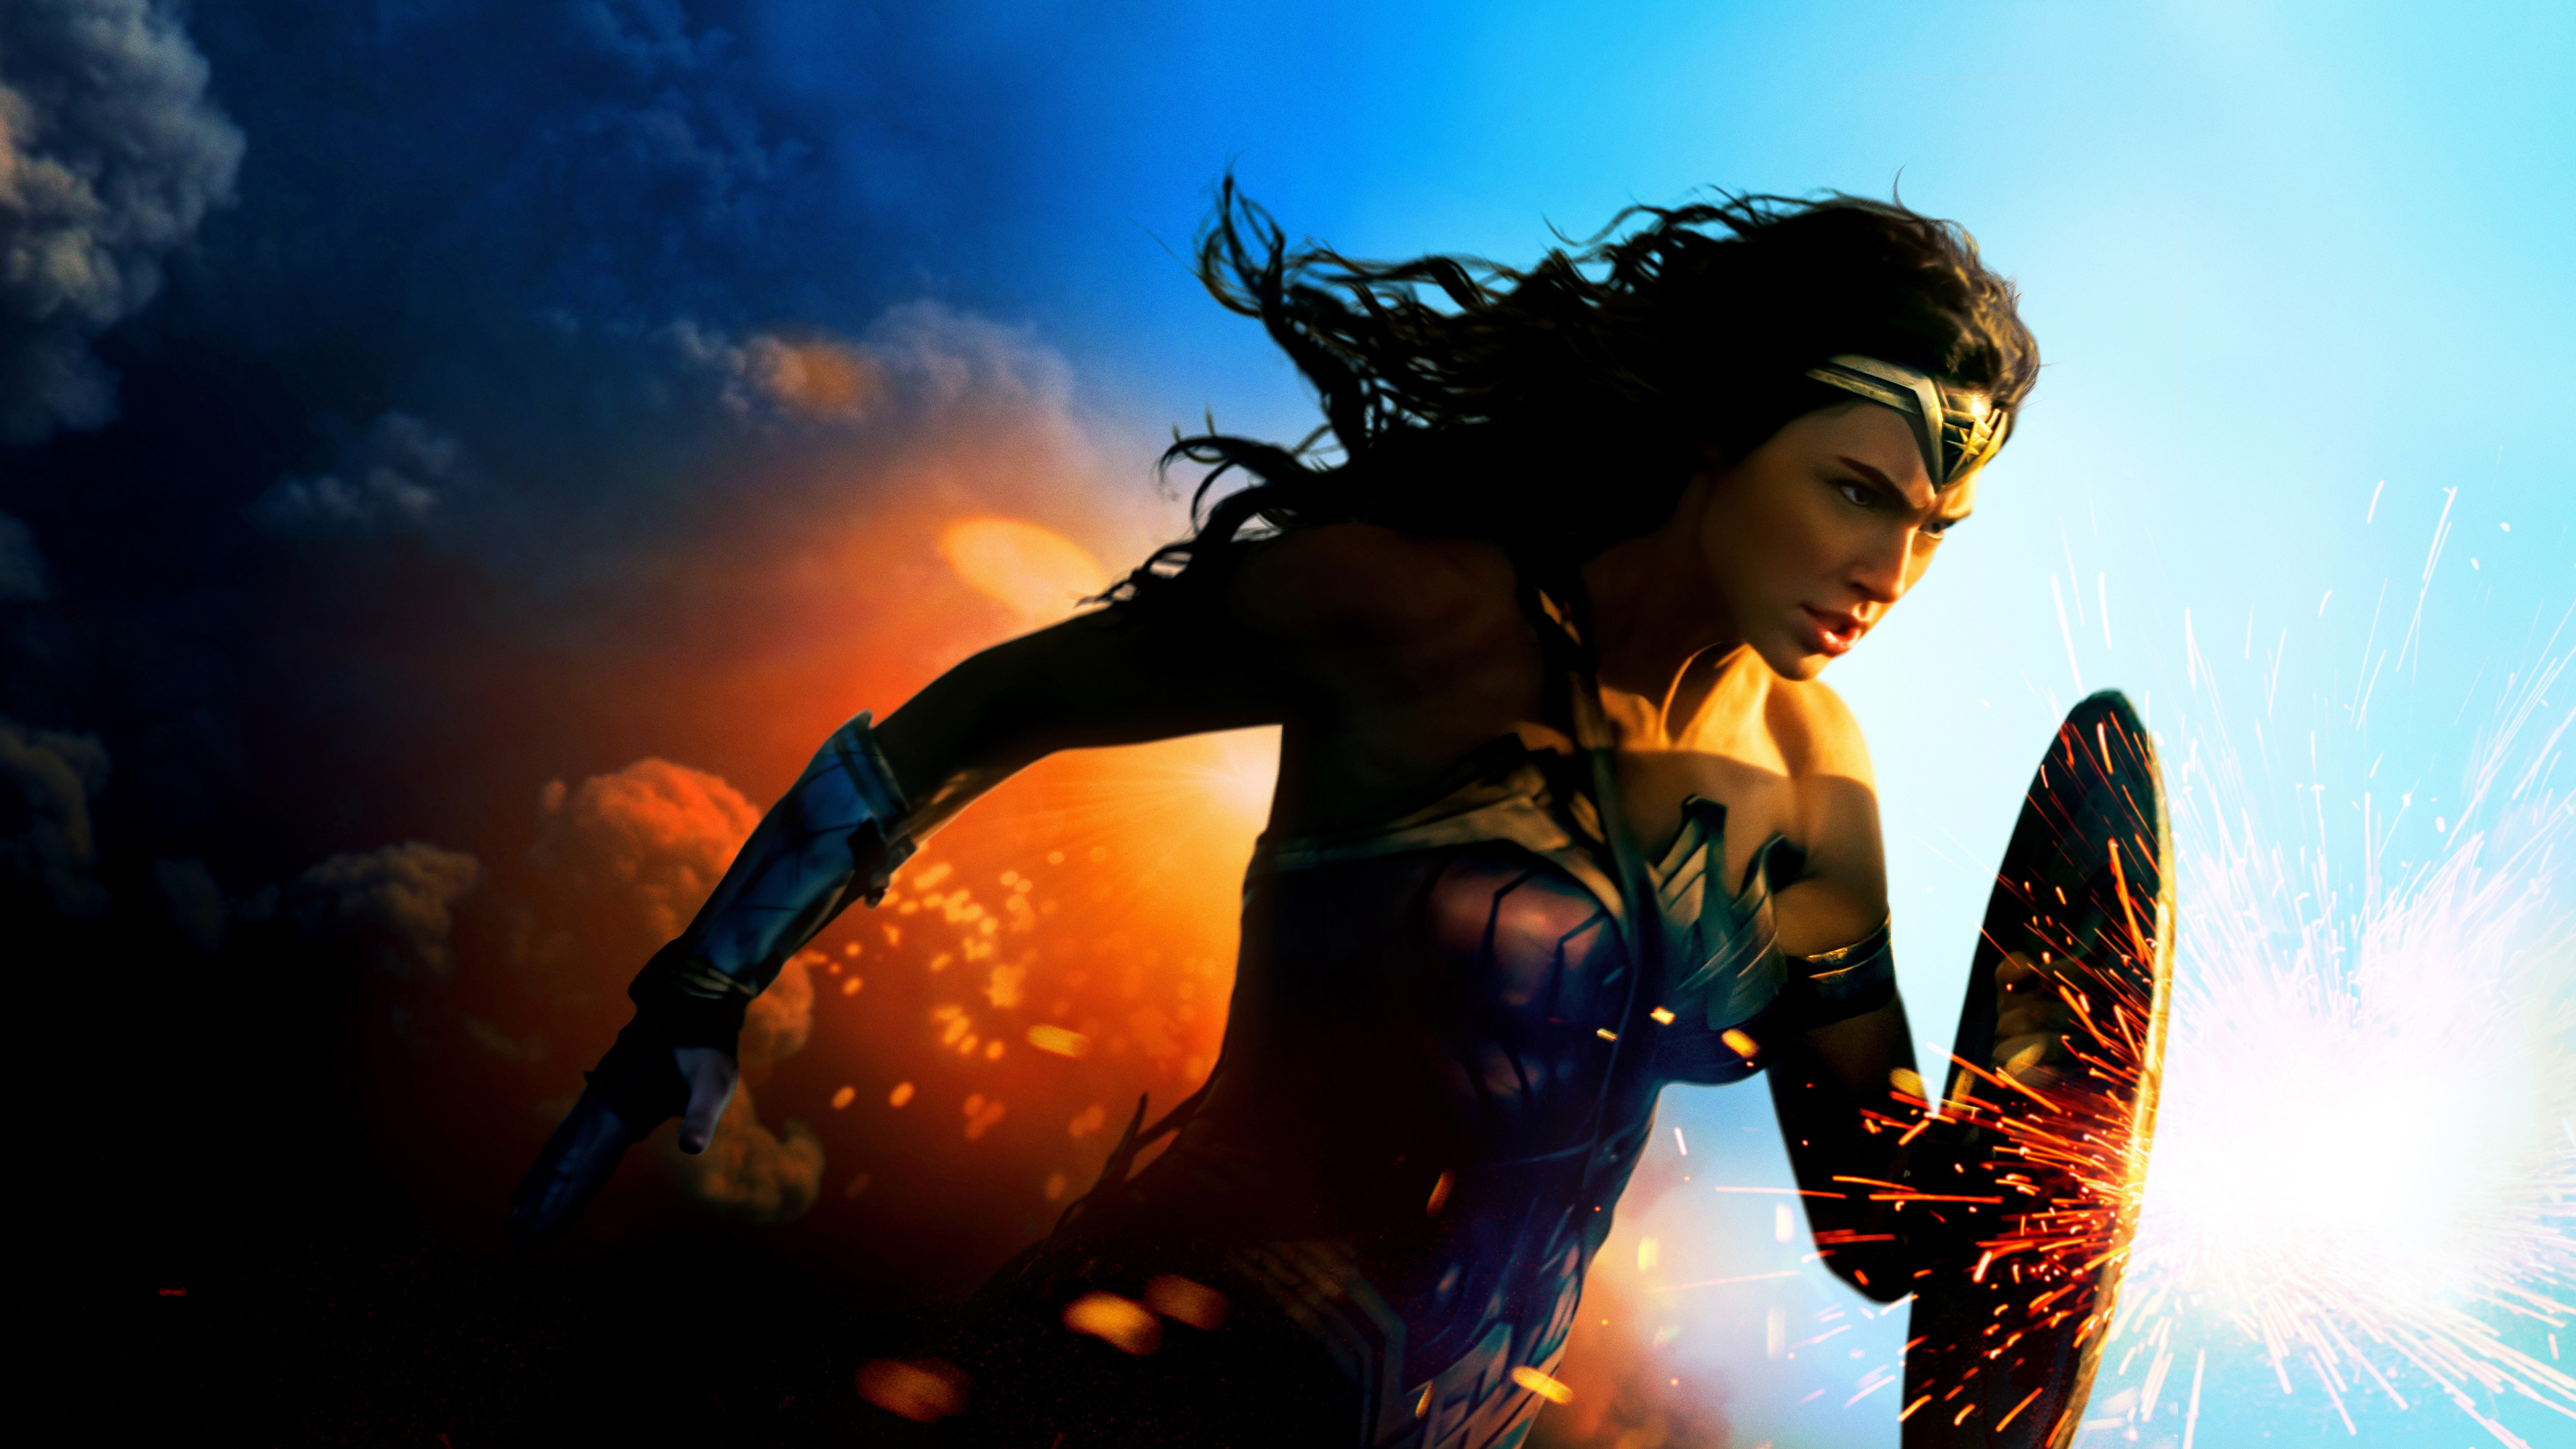 new wonder woman 1569186977 - New Wonder Woman - wonder woman wallpapers, superheroes wallpapers, hd-wallpapers, gal gadot wallpapers, 8k wallpapers, 5k wallpapers, 4k-wallpapers